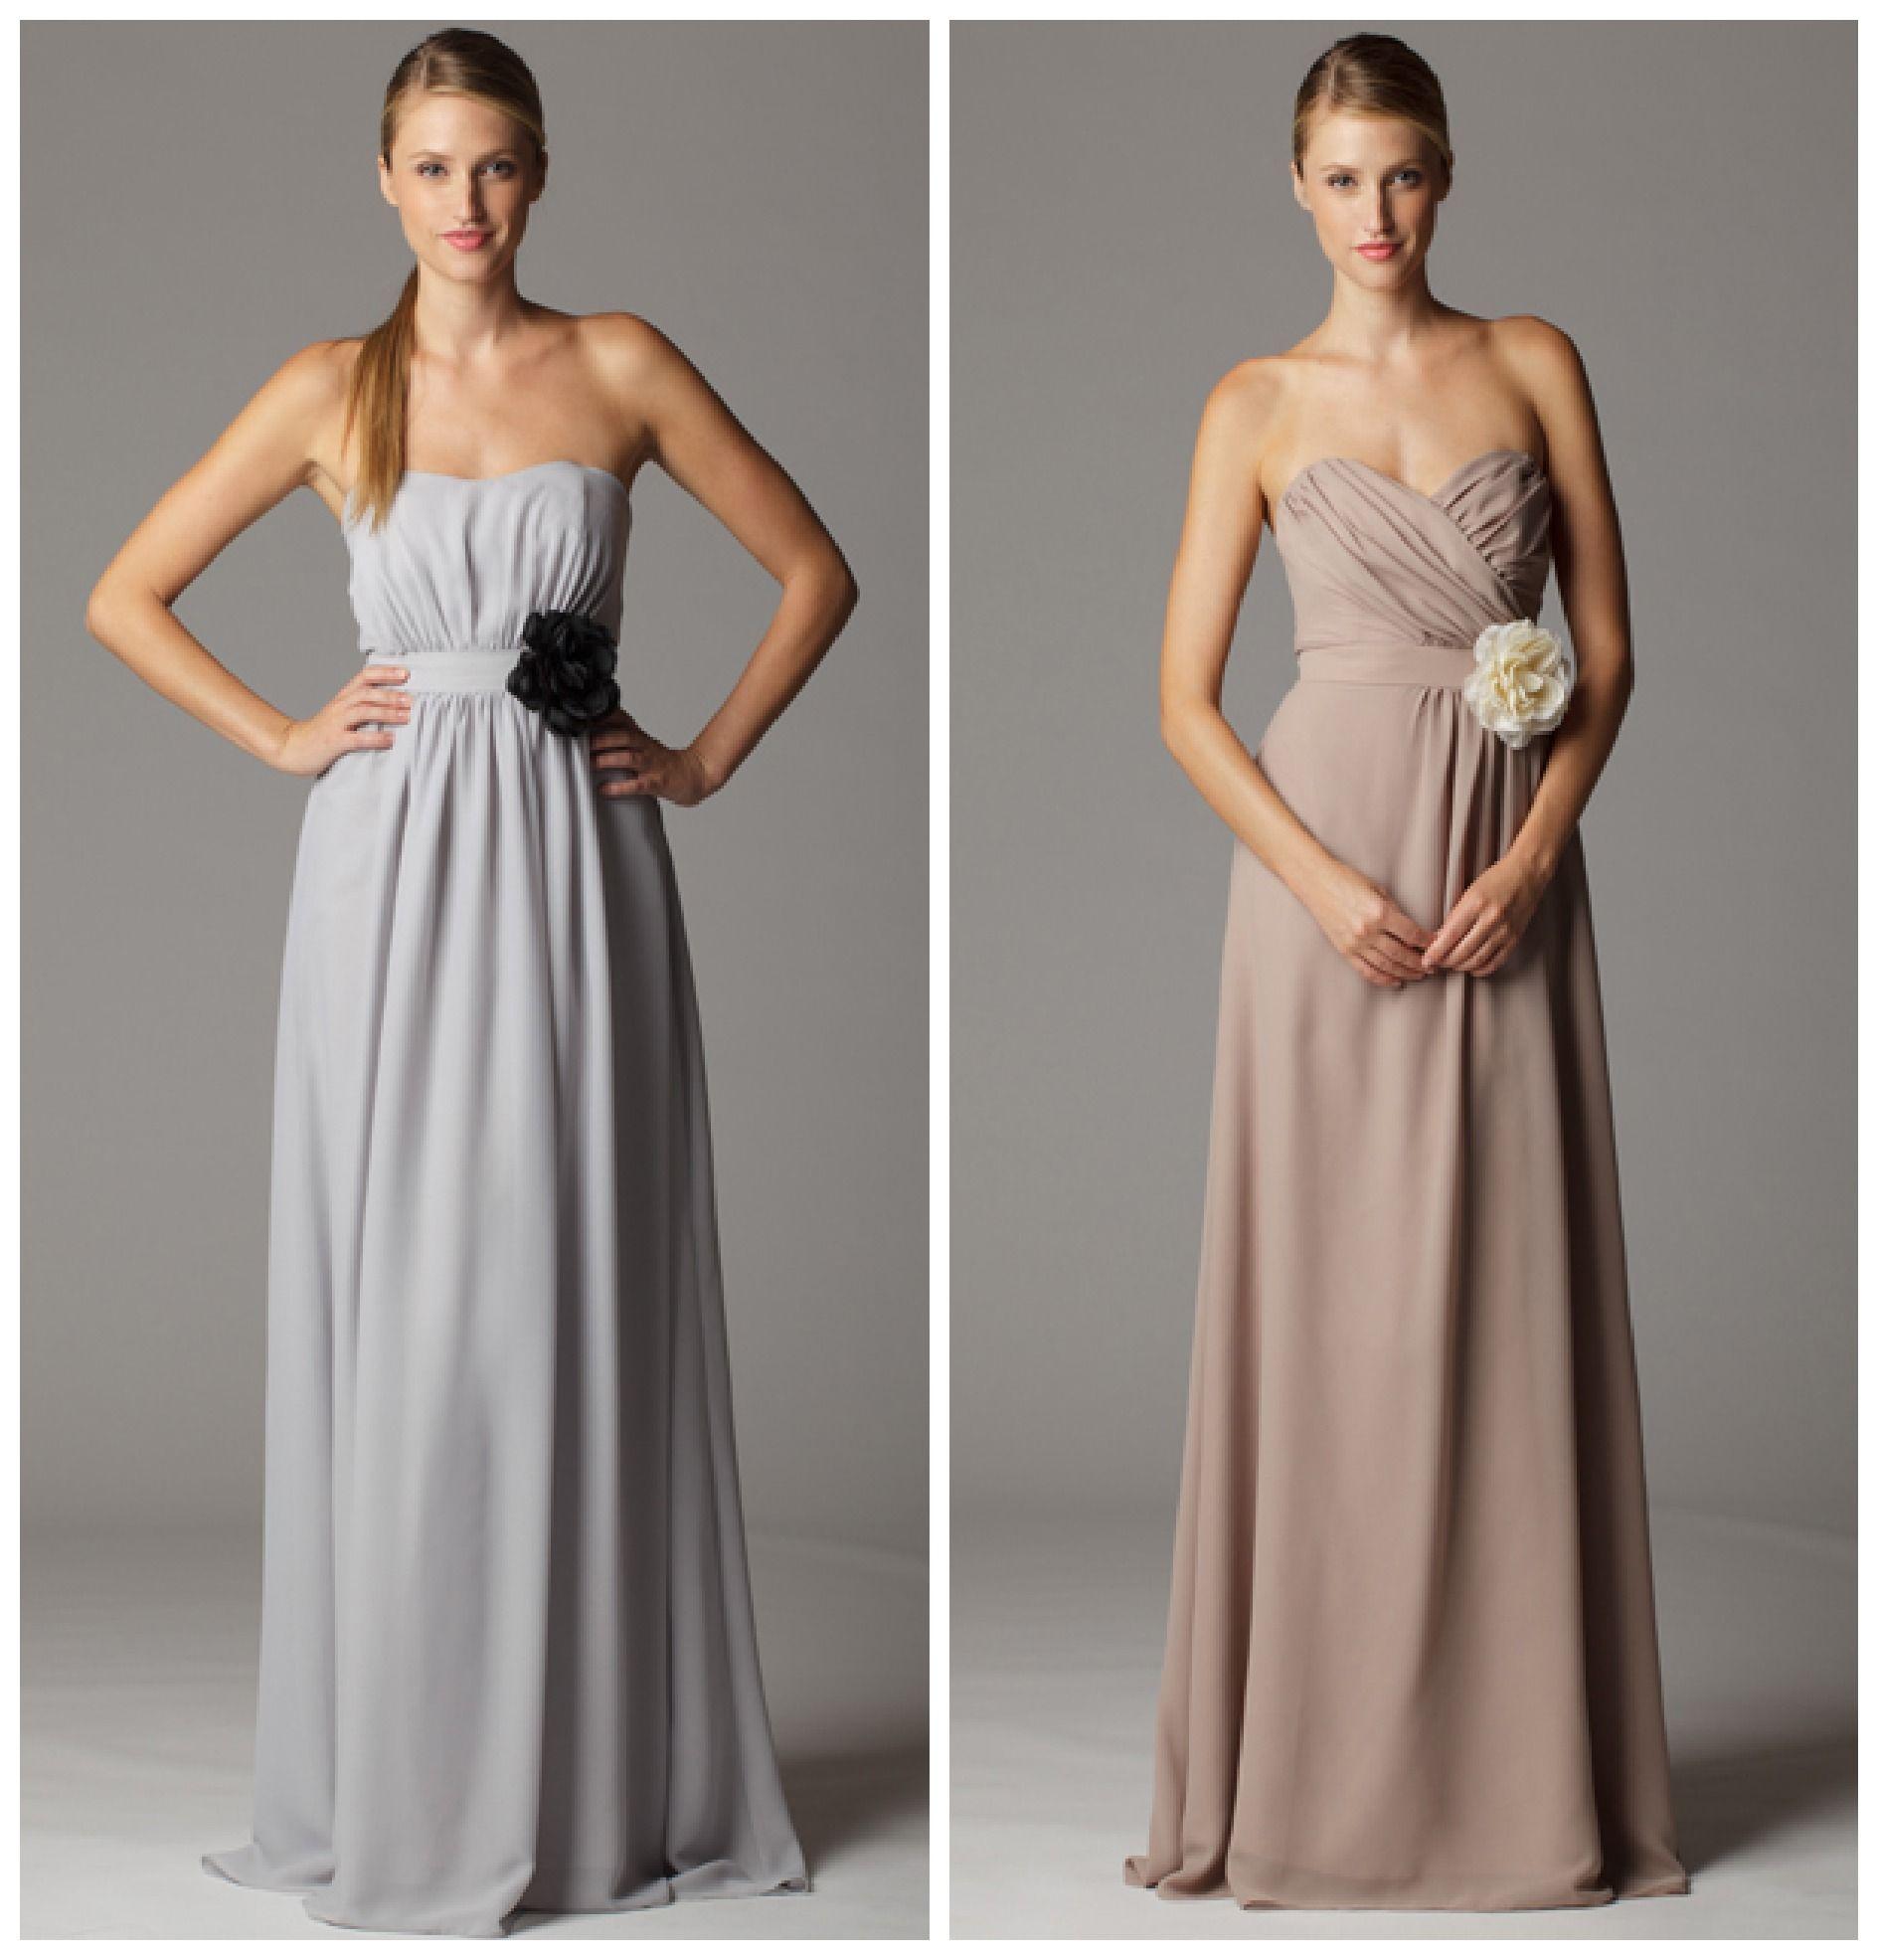 Soft & Flowy Bridesmaid Dresses | Matrimonio, Castani chiaro e Ricerca